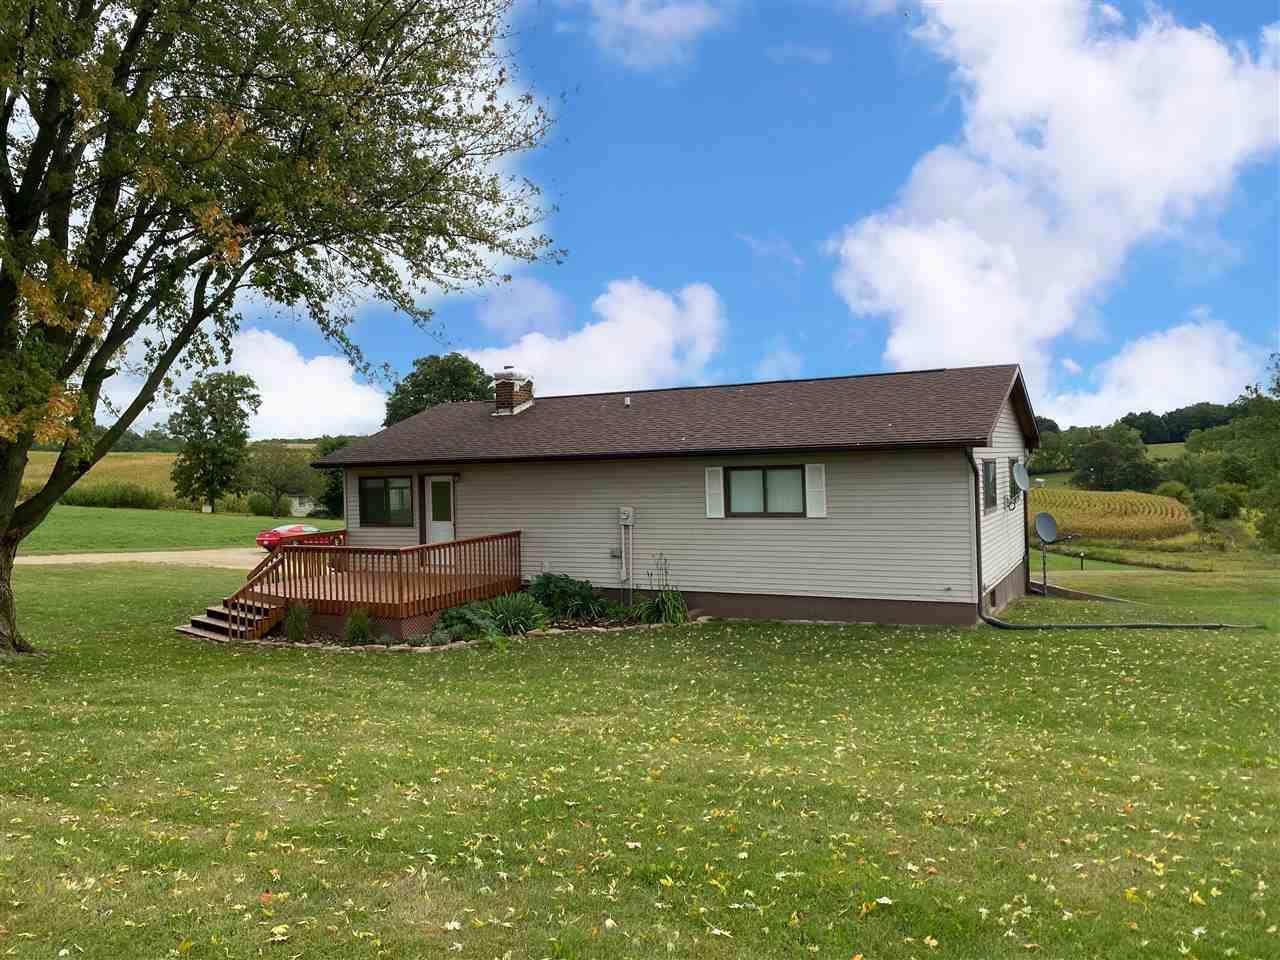 28464 Boydtown Hollow Rd - Photo 1